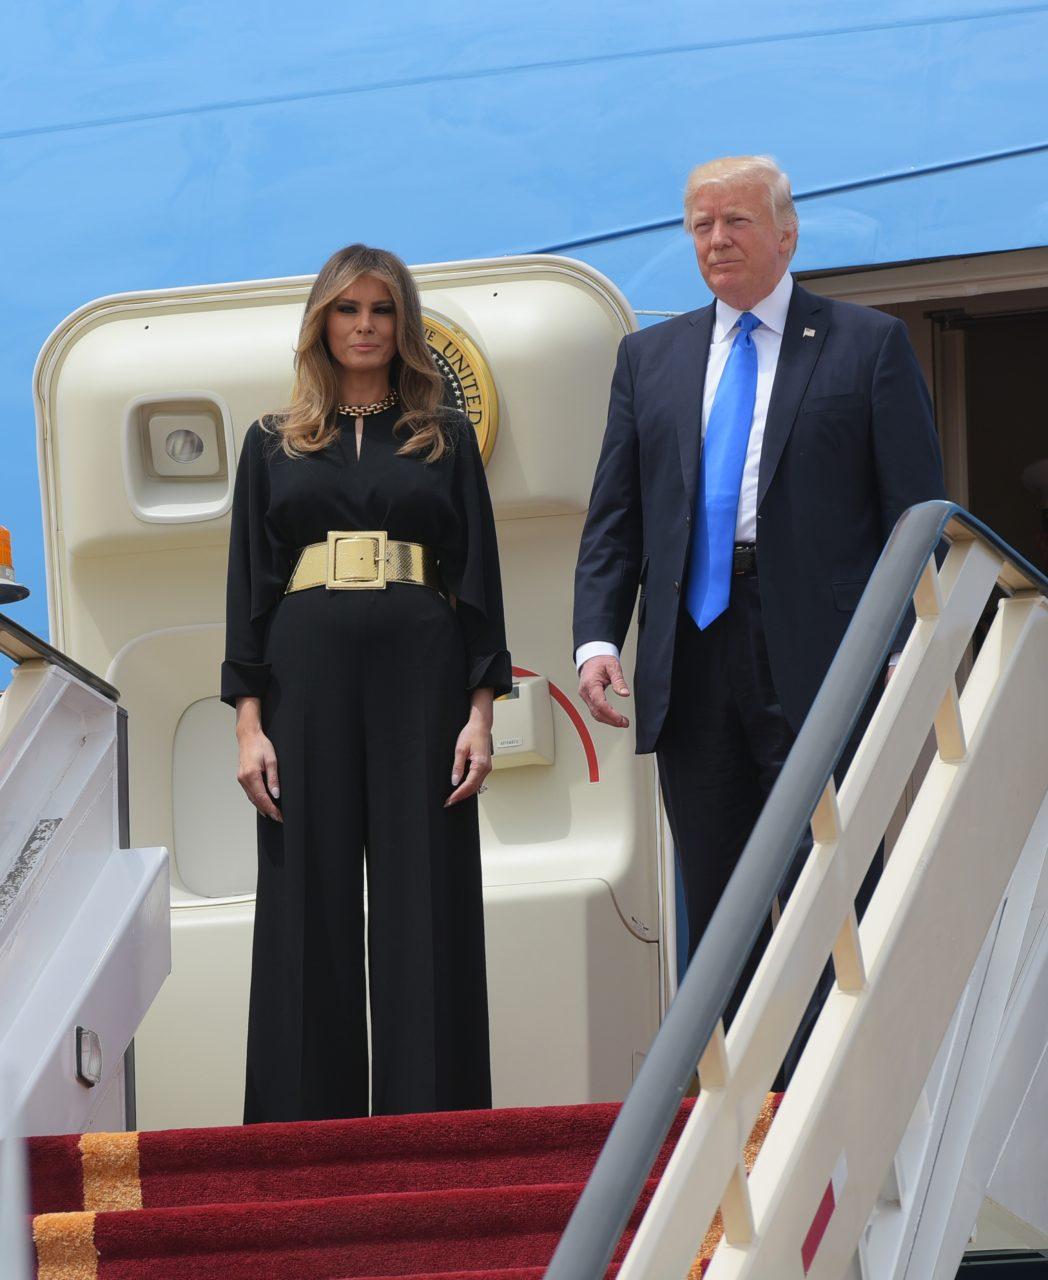 Photos First Lady Melania Trump Radiates In High Fashion